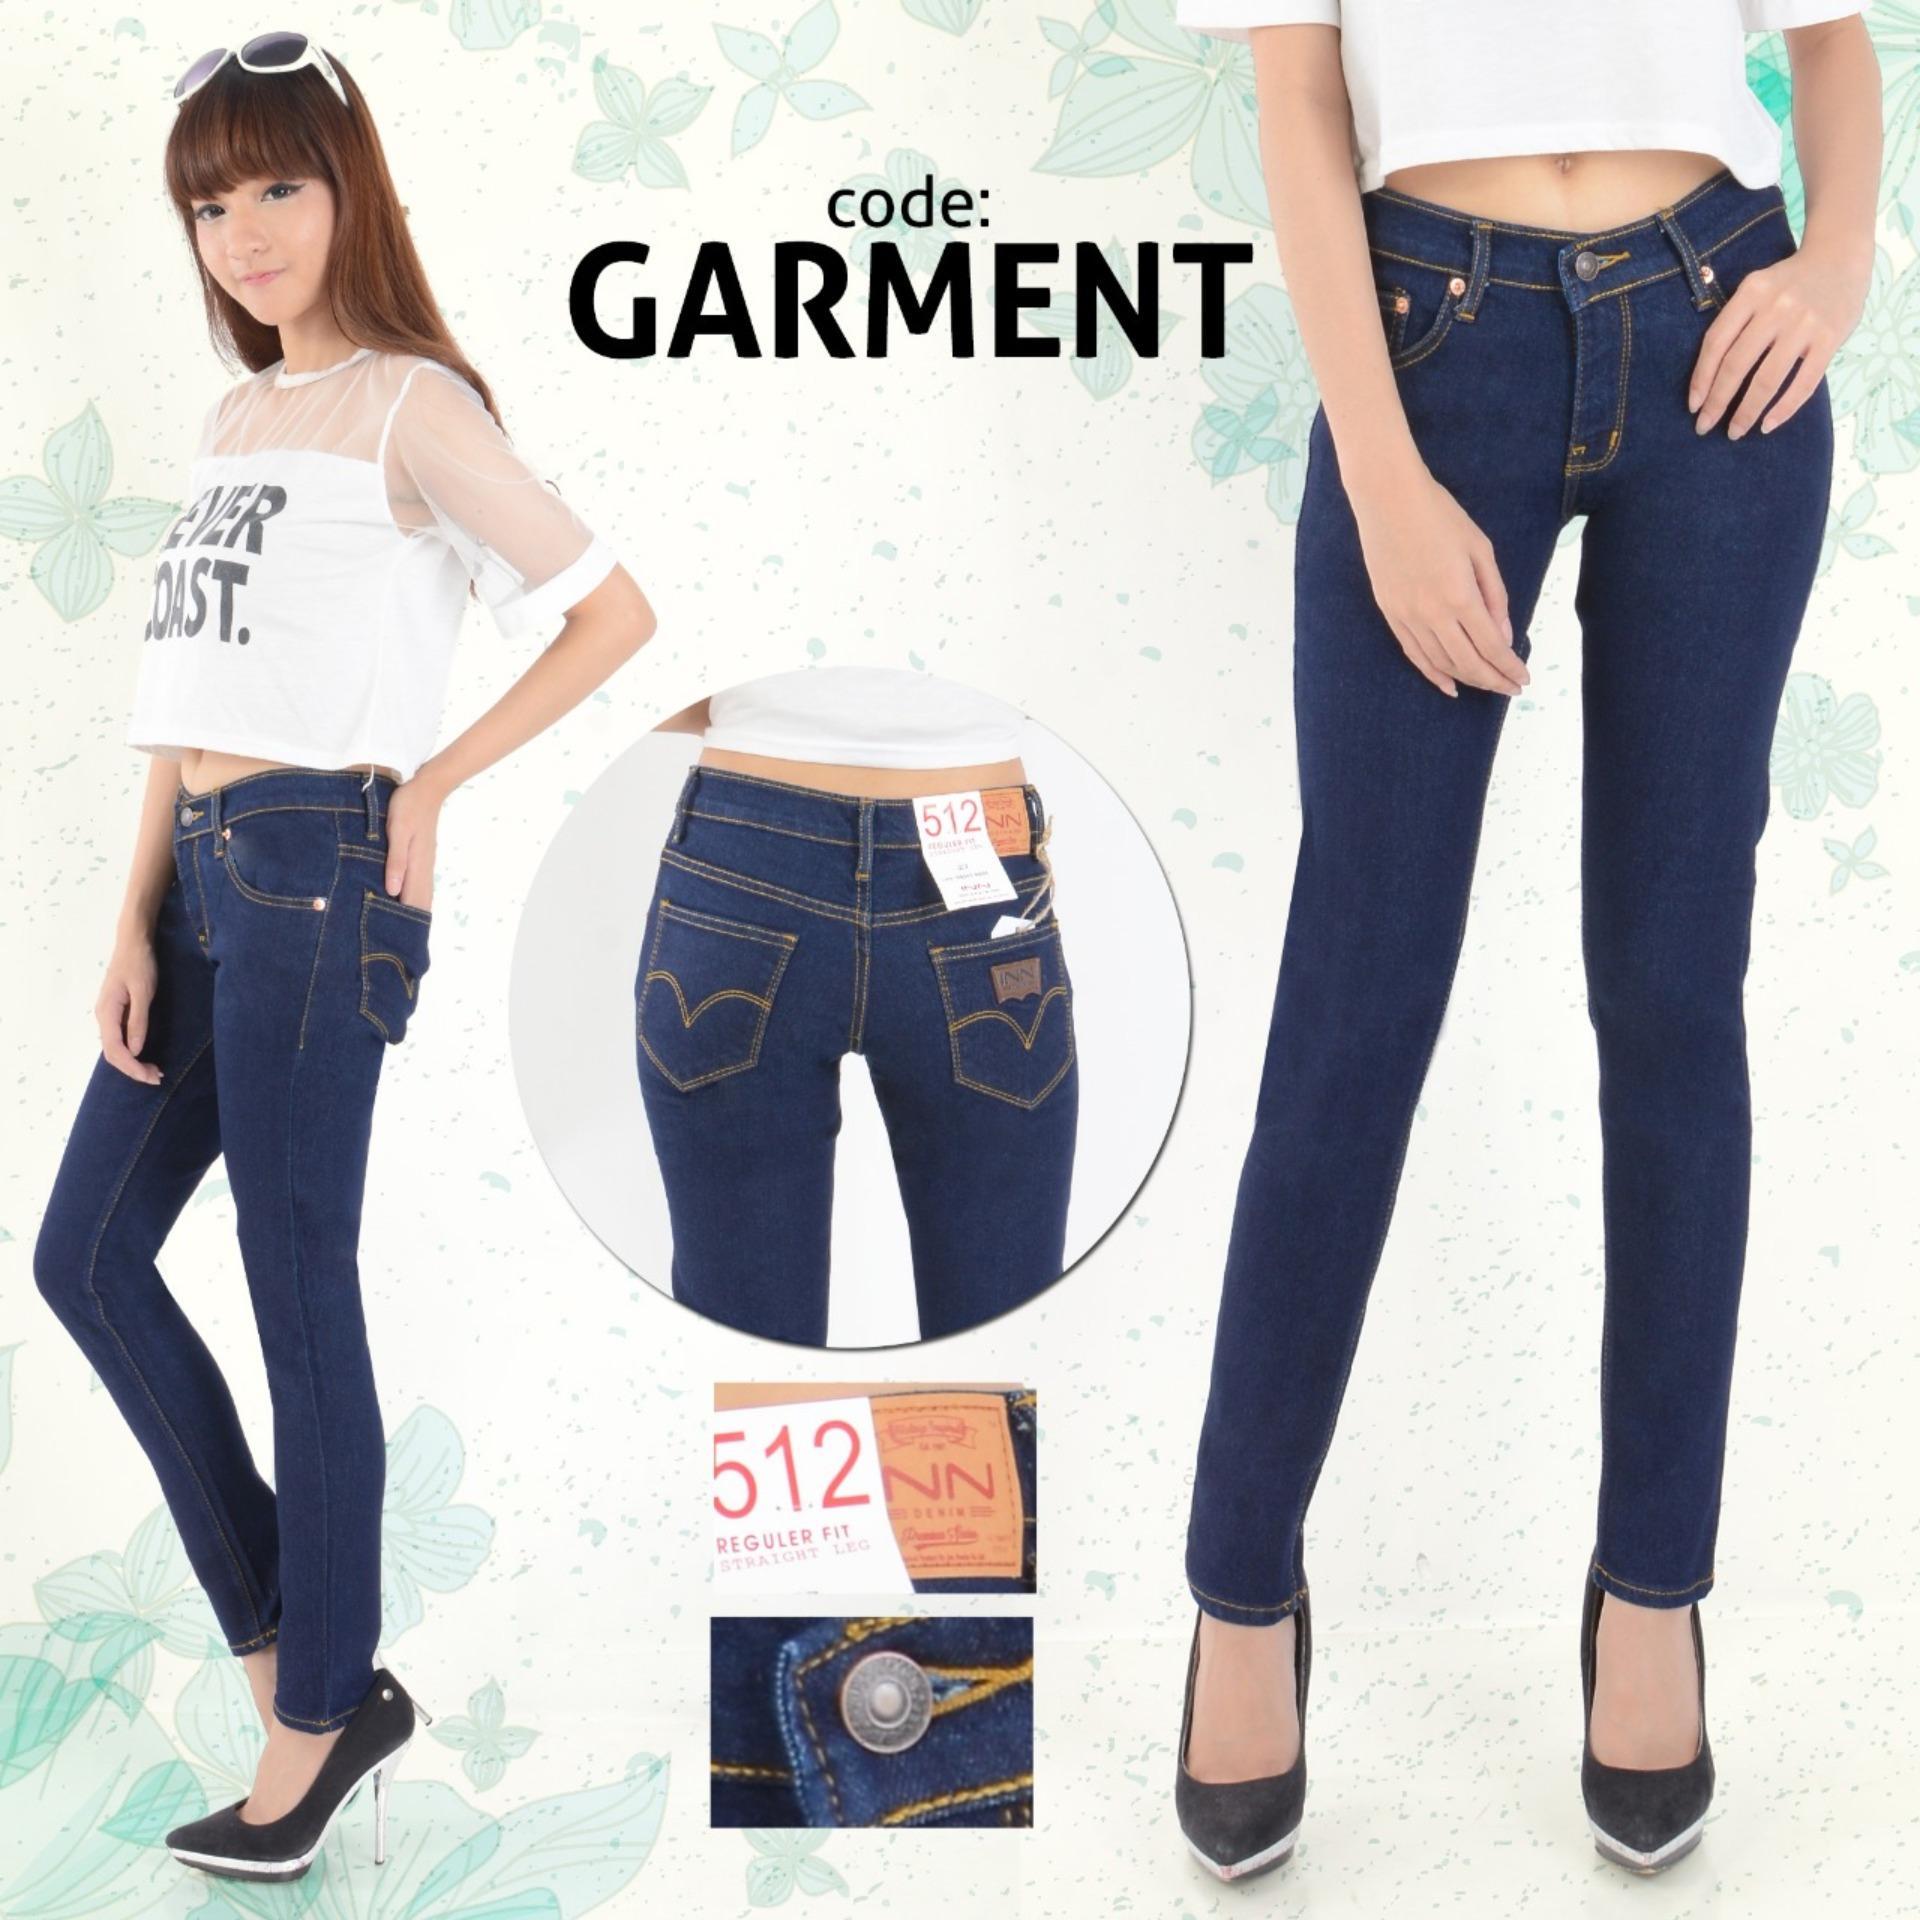 Harga Hemat Saroha Jeans Celana Jeans Wanita Skinny Street Berbahan Soft Jeans Street Restleting Kuat Jahitan Rapi Murah